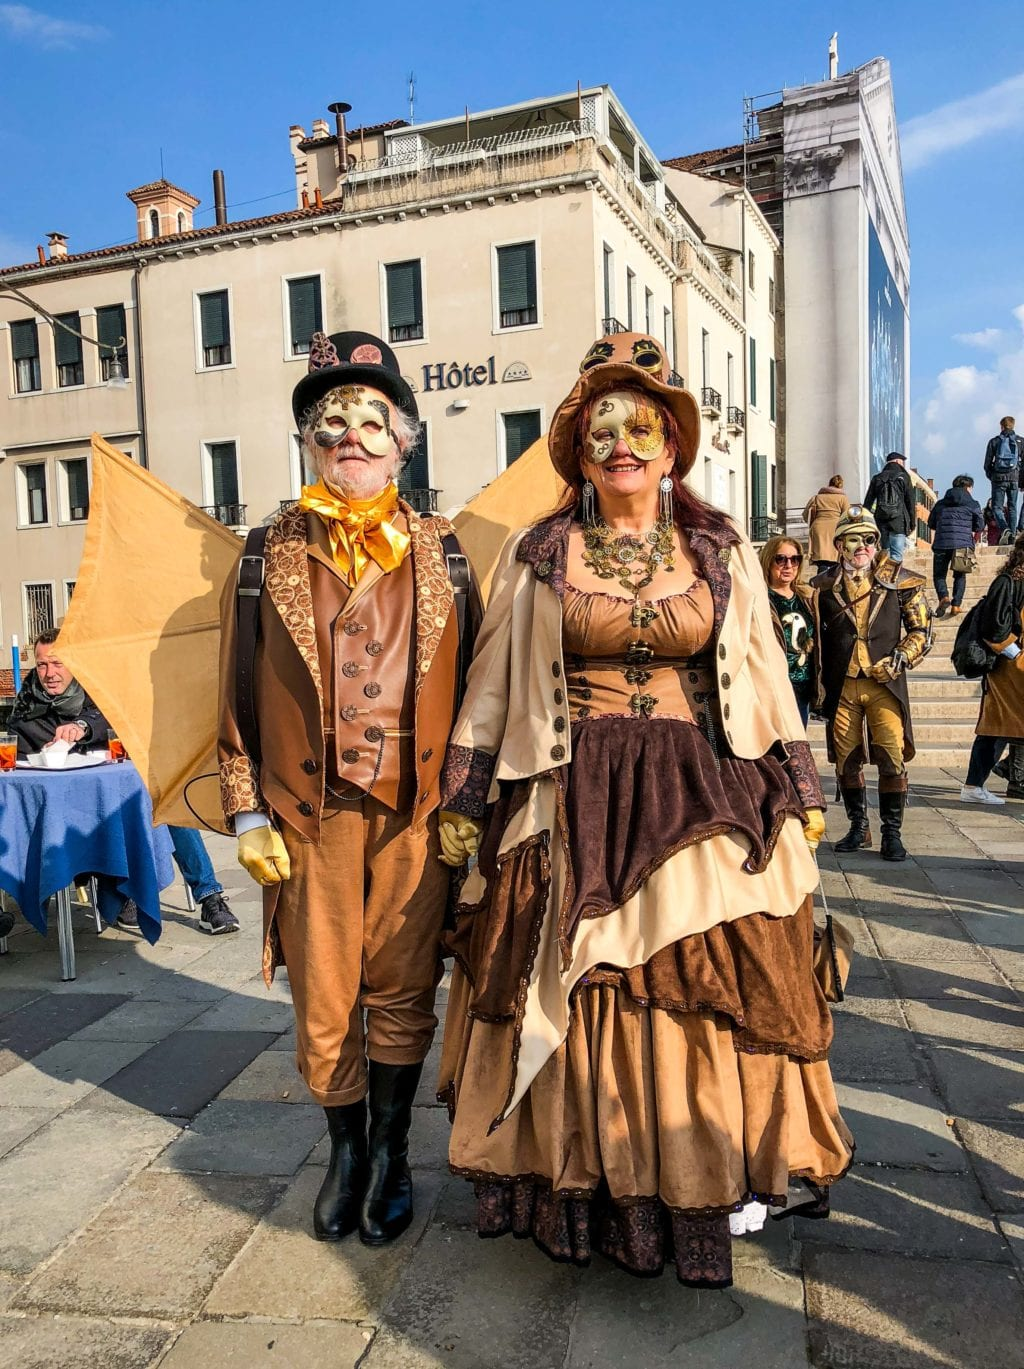 venice carnival costumes, venice carnival 2018 photos, venice carnival, carnival venice italy, venice carnival, carnevale di venezia